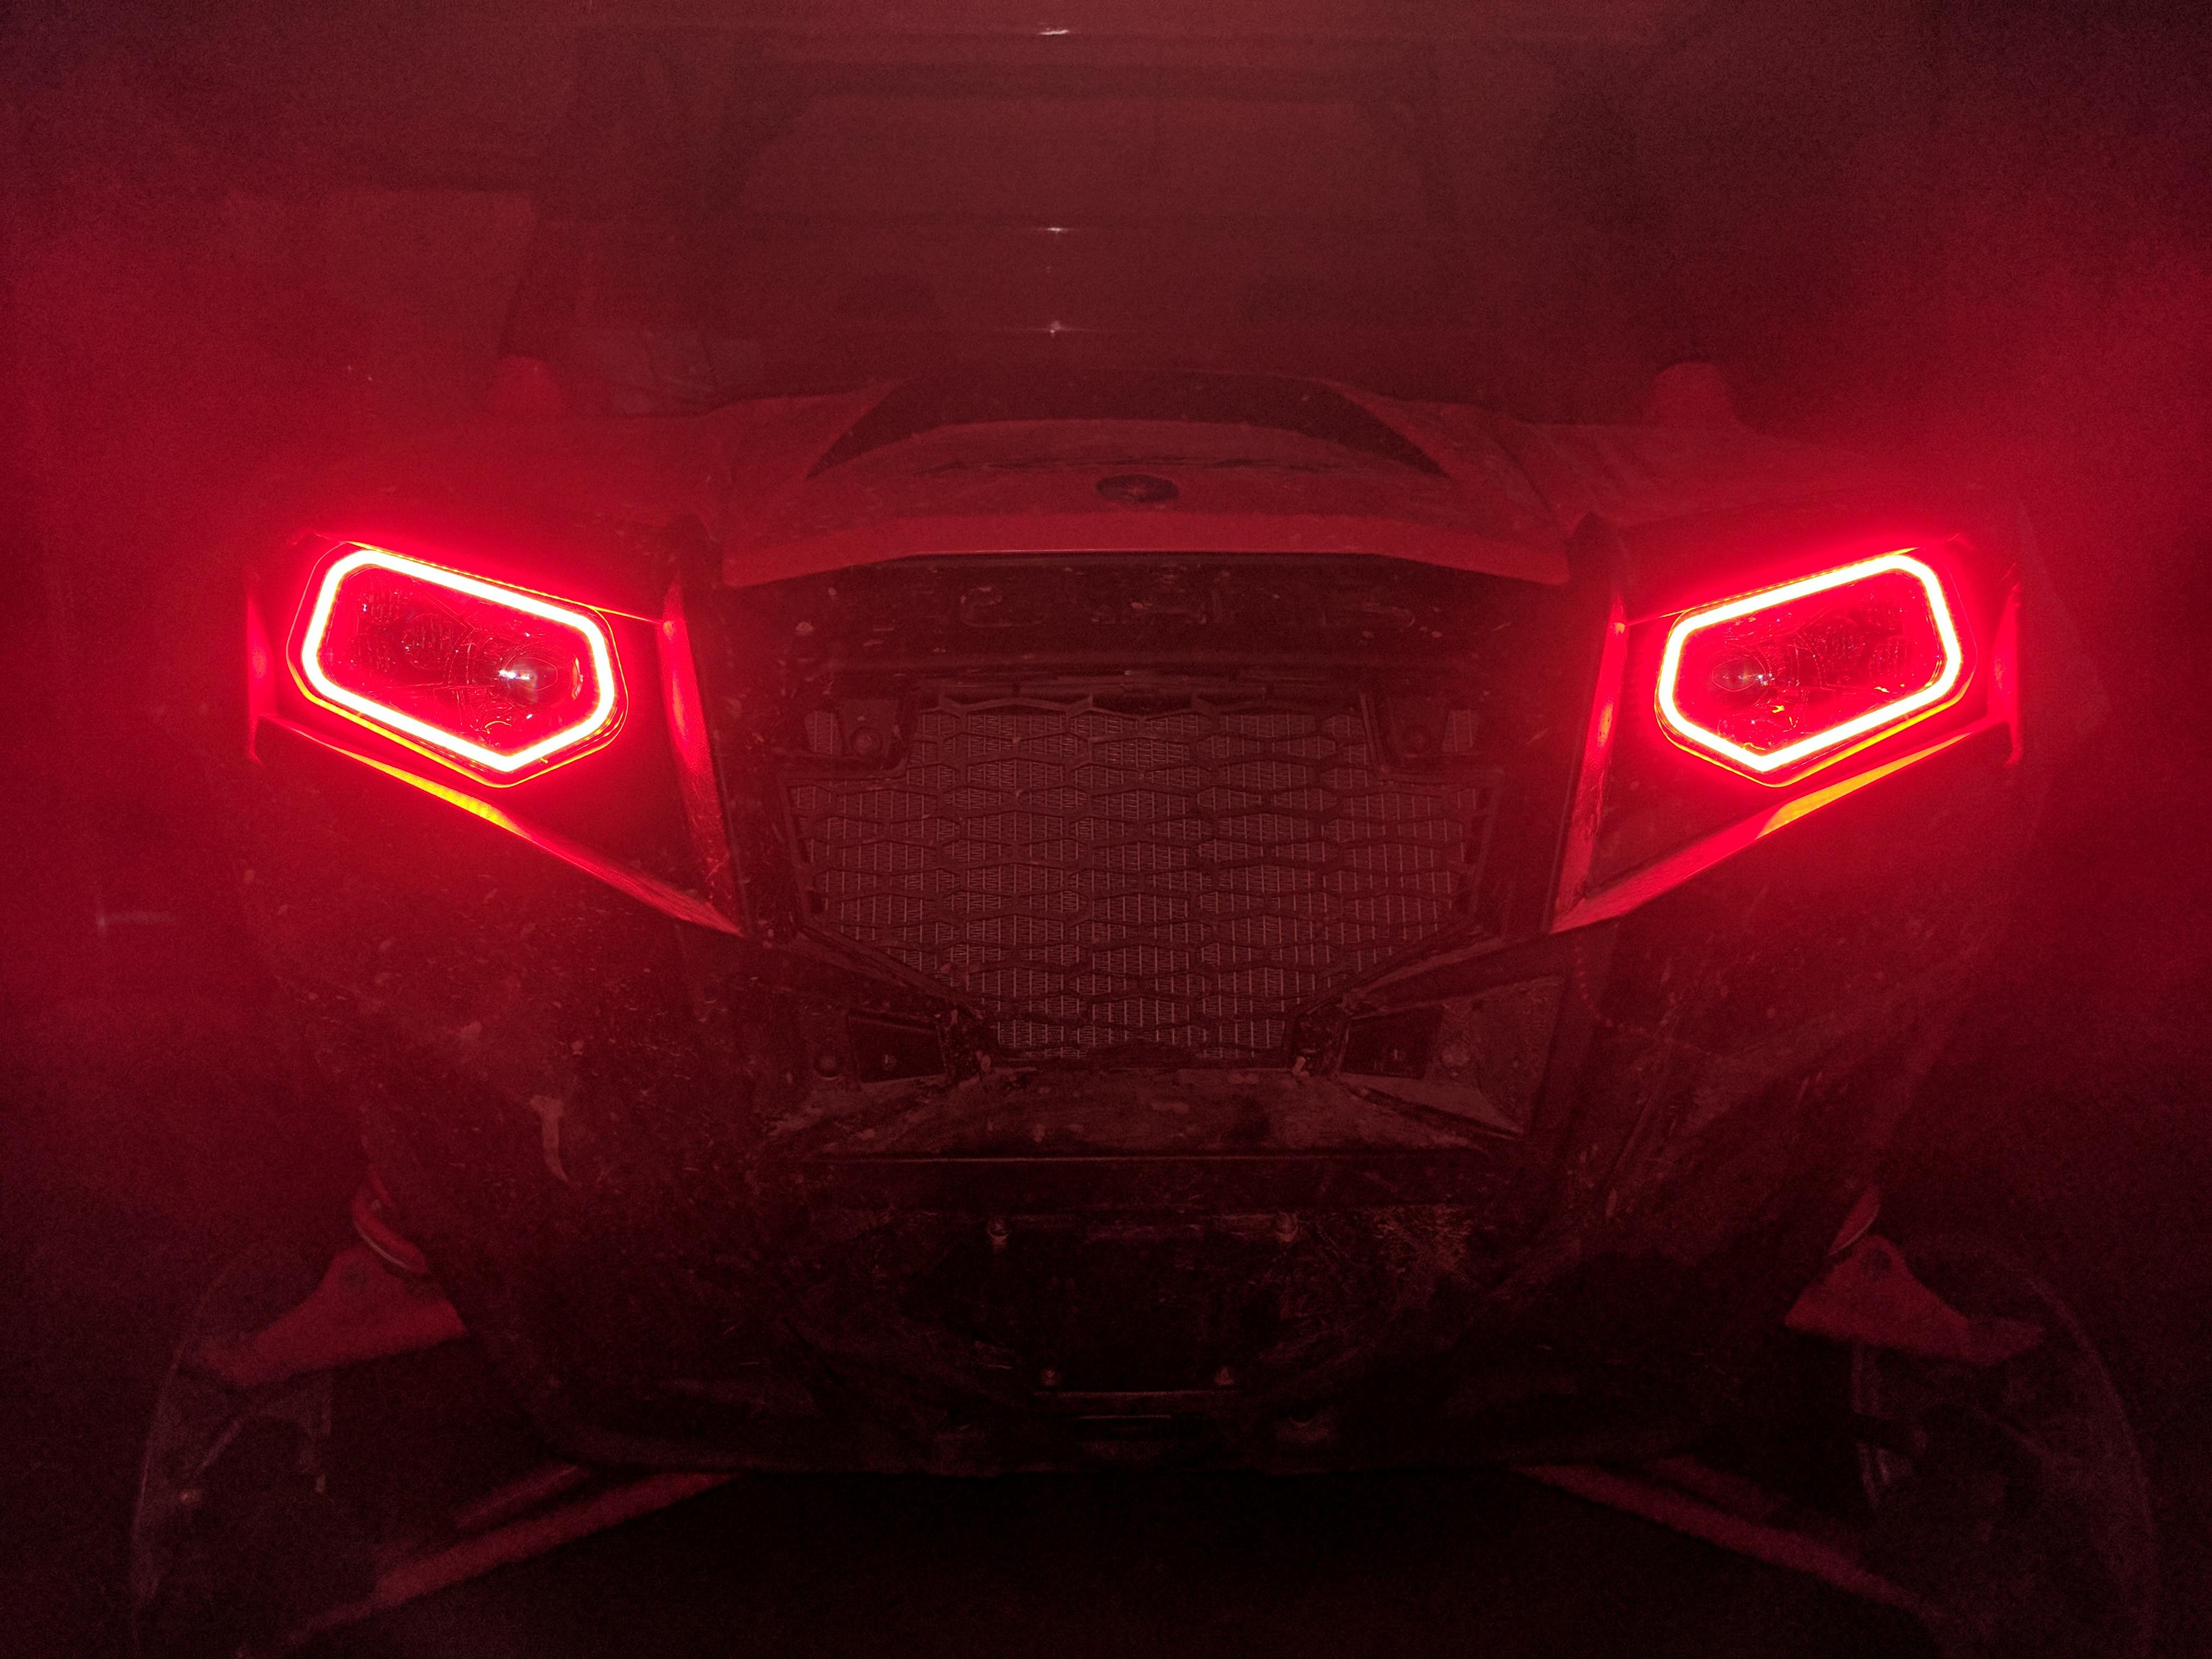 Polaris RZR 900 xp 800  570 Halo Rings set for headlights